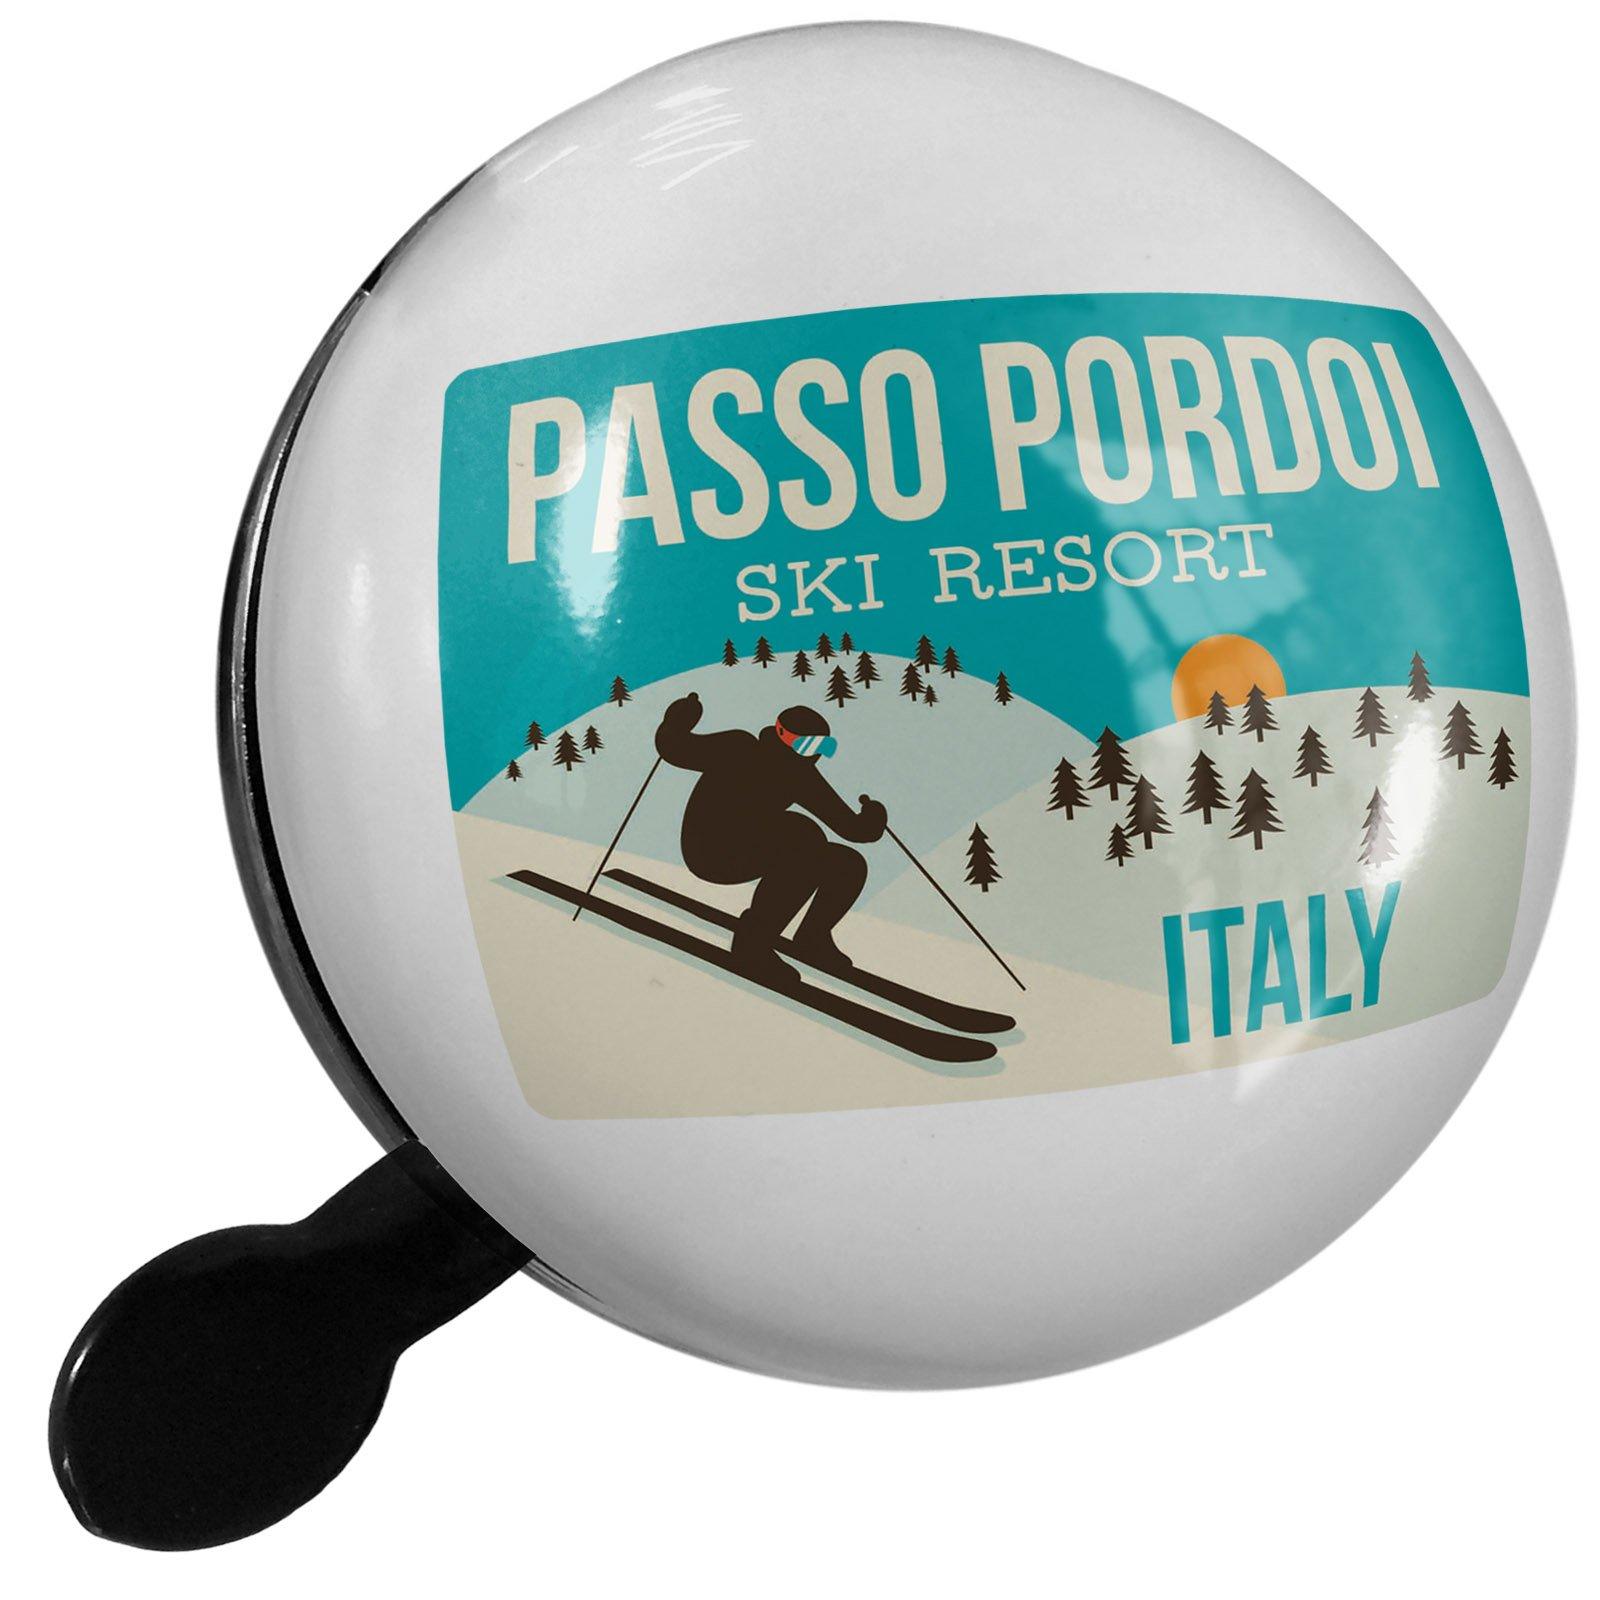 Small Bike Bell Passo Pordoi Ski Resort - Italy Ski Resort - NEONBLOND